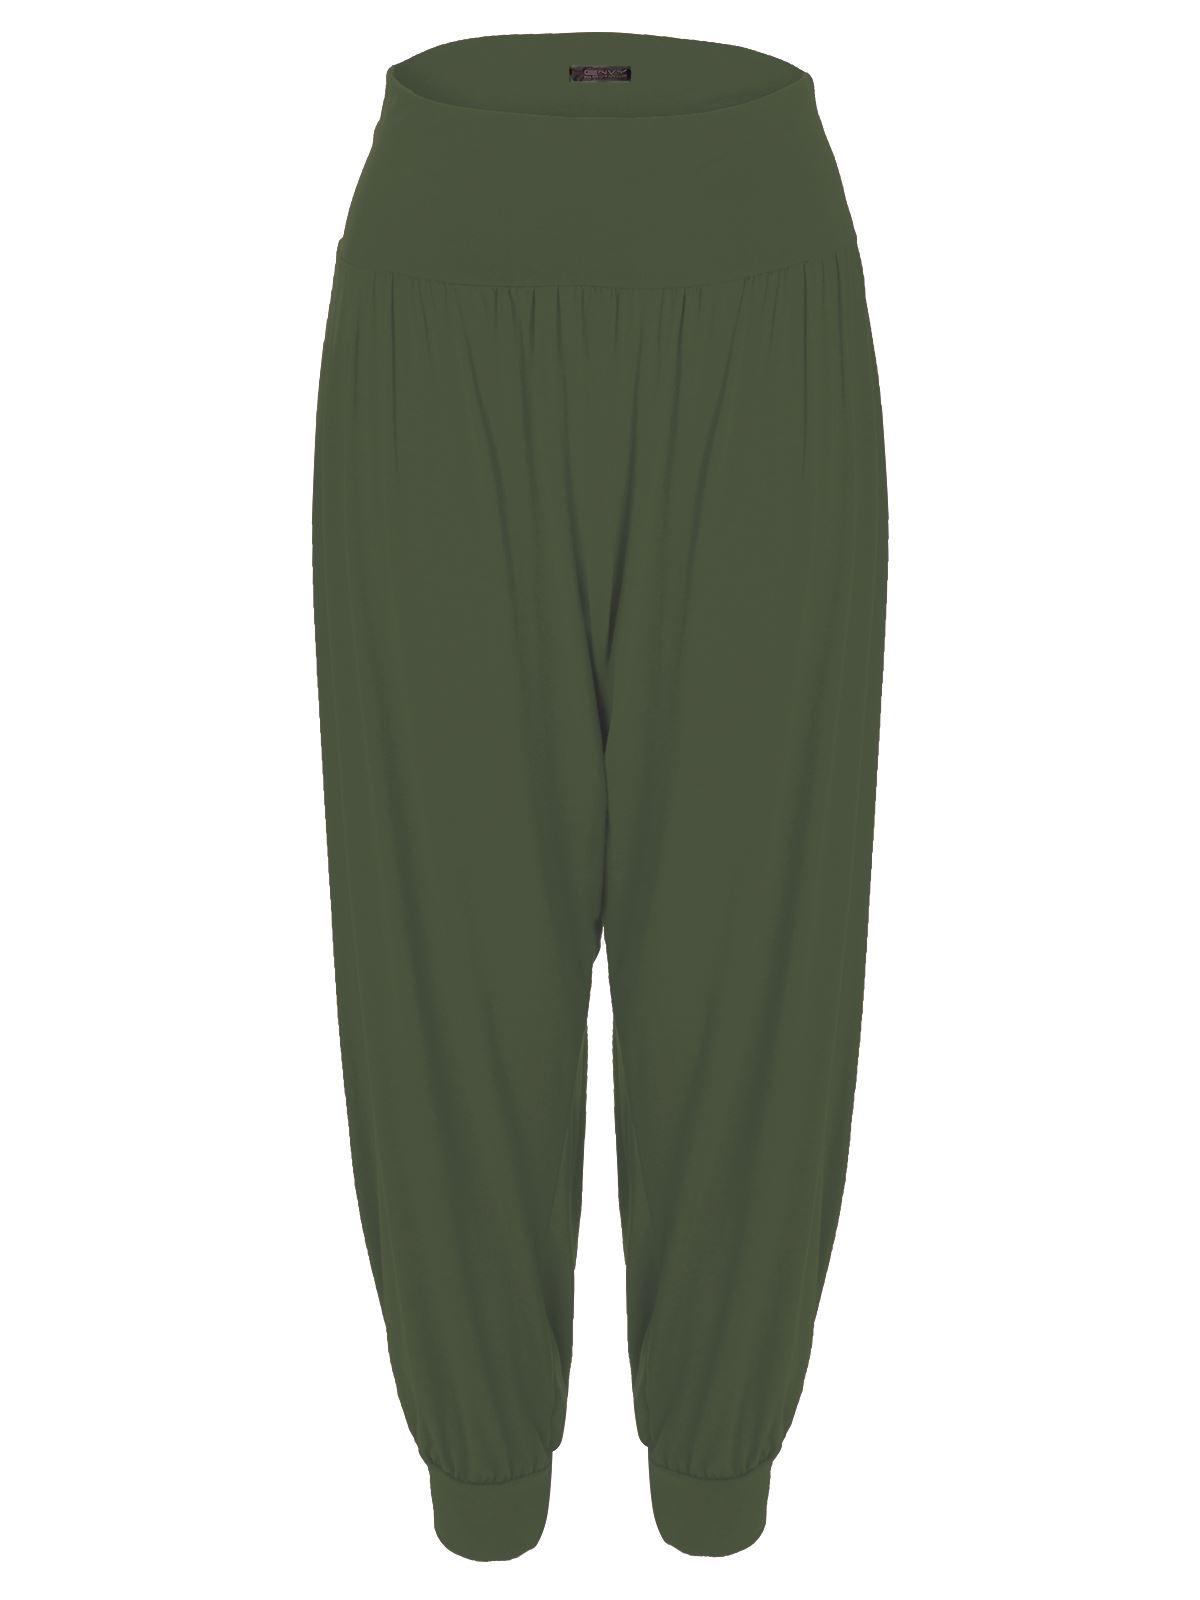 Yoga pants women, harem pants women, baggy pants, yogapants short, yoga pants plus size, gift for women, trendy plus size, baggy sweatpants OnniPalermo 5 .